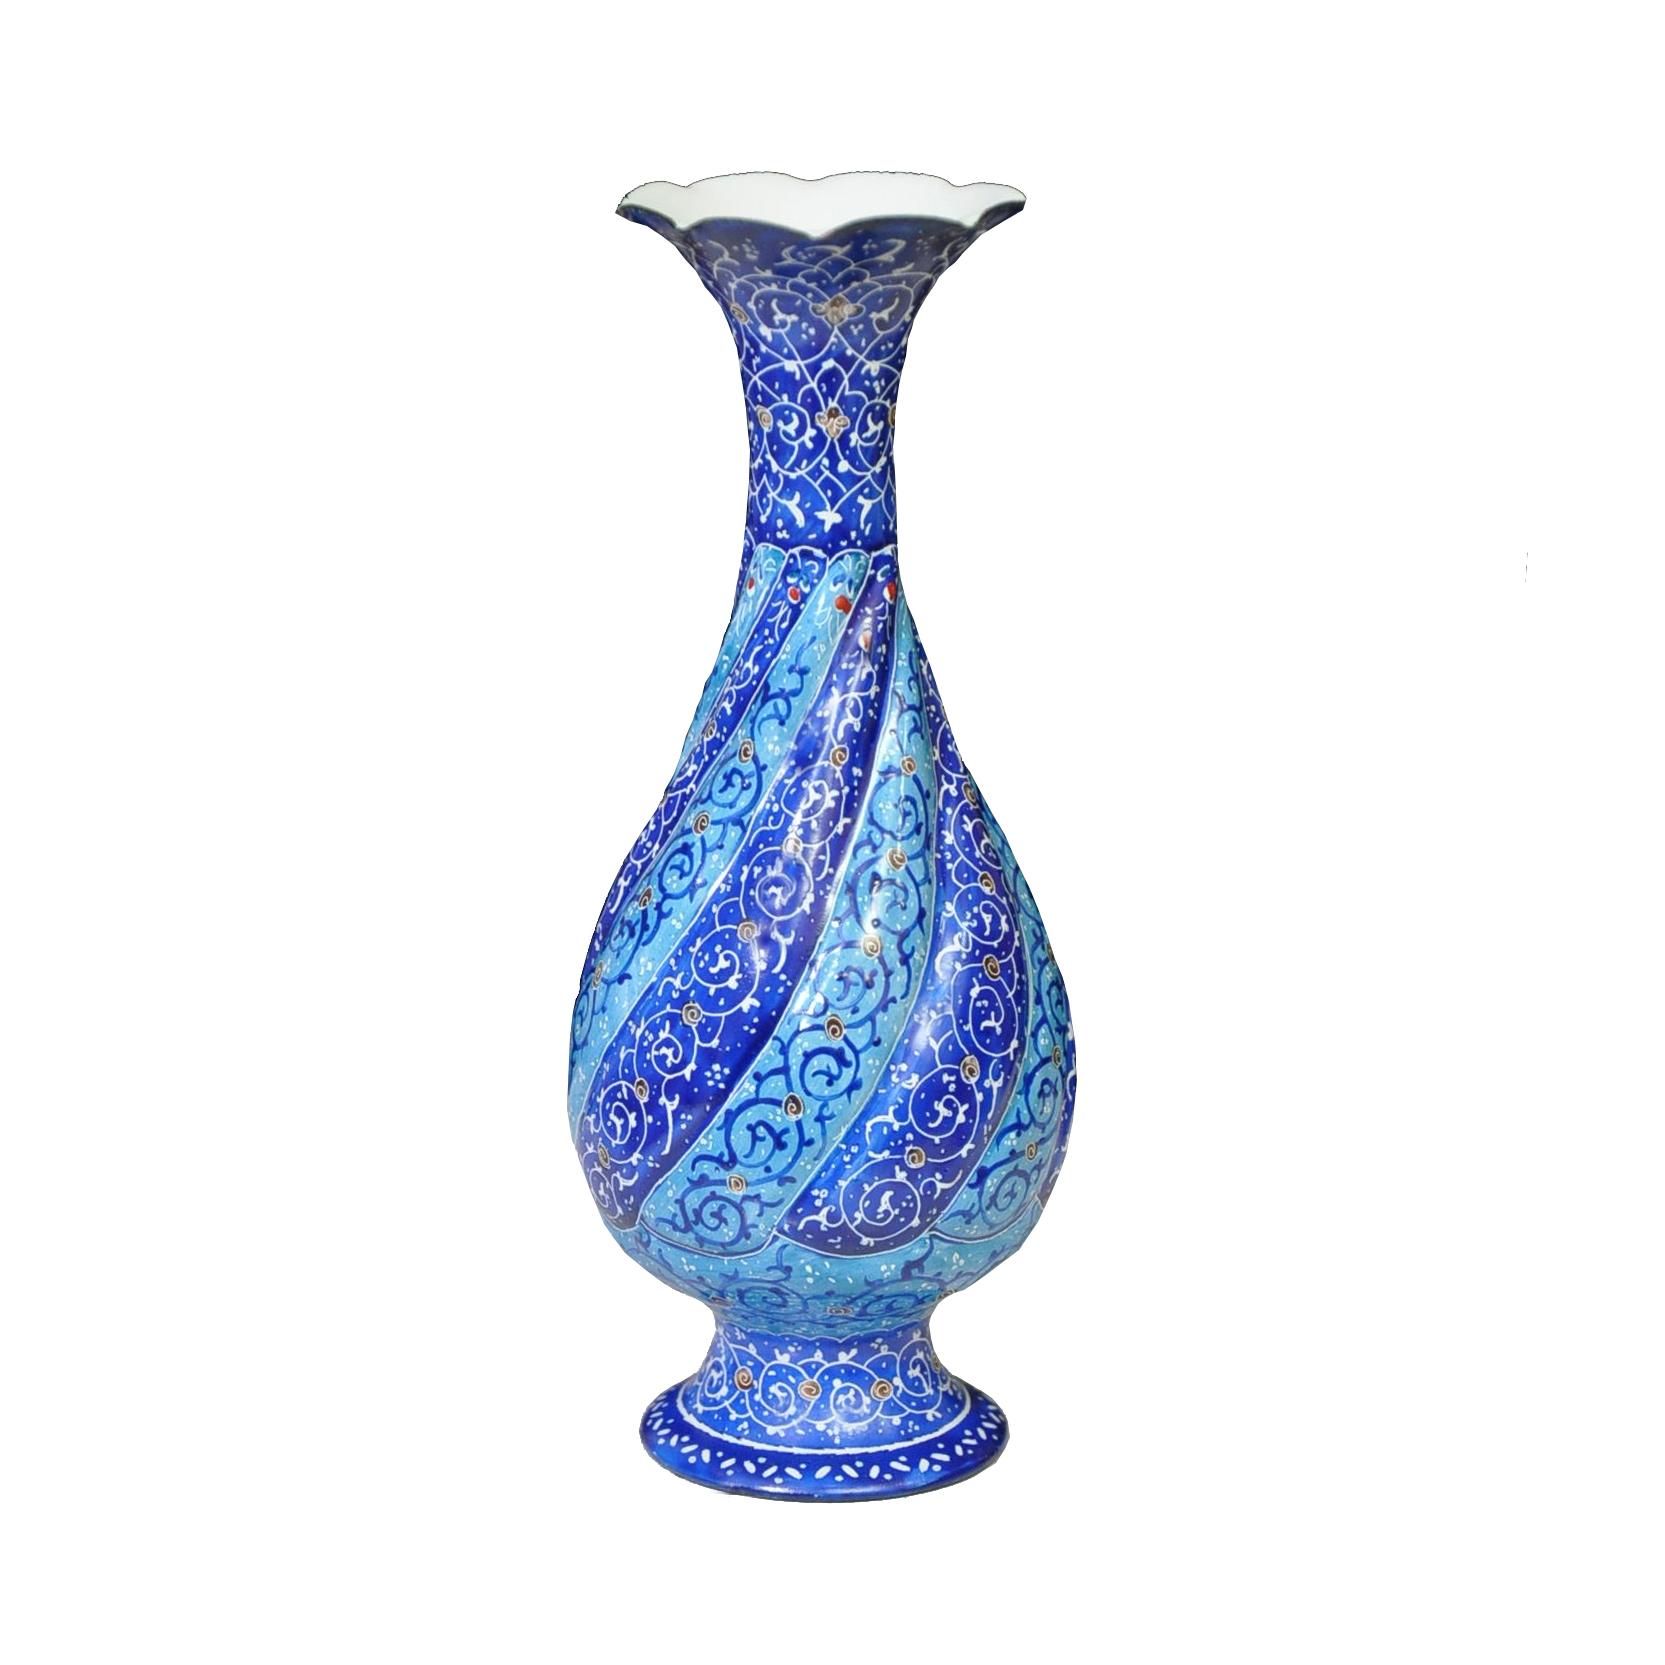 Copper Enamel vase, code 20